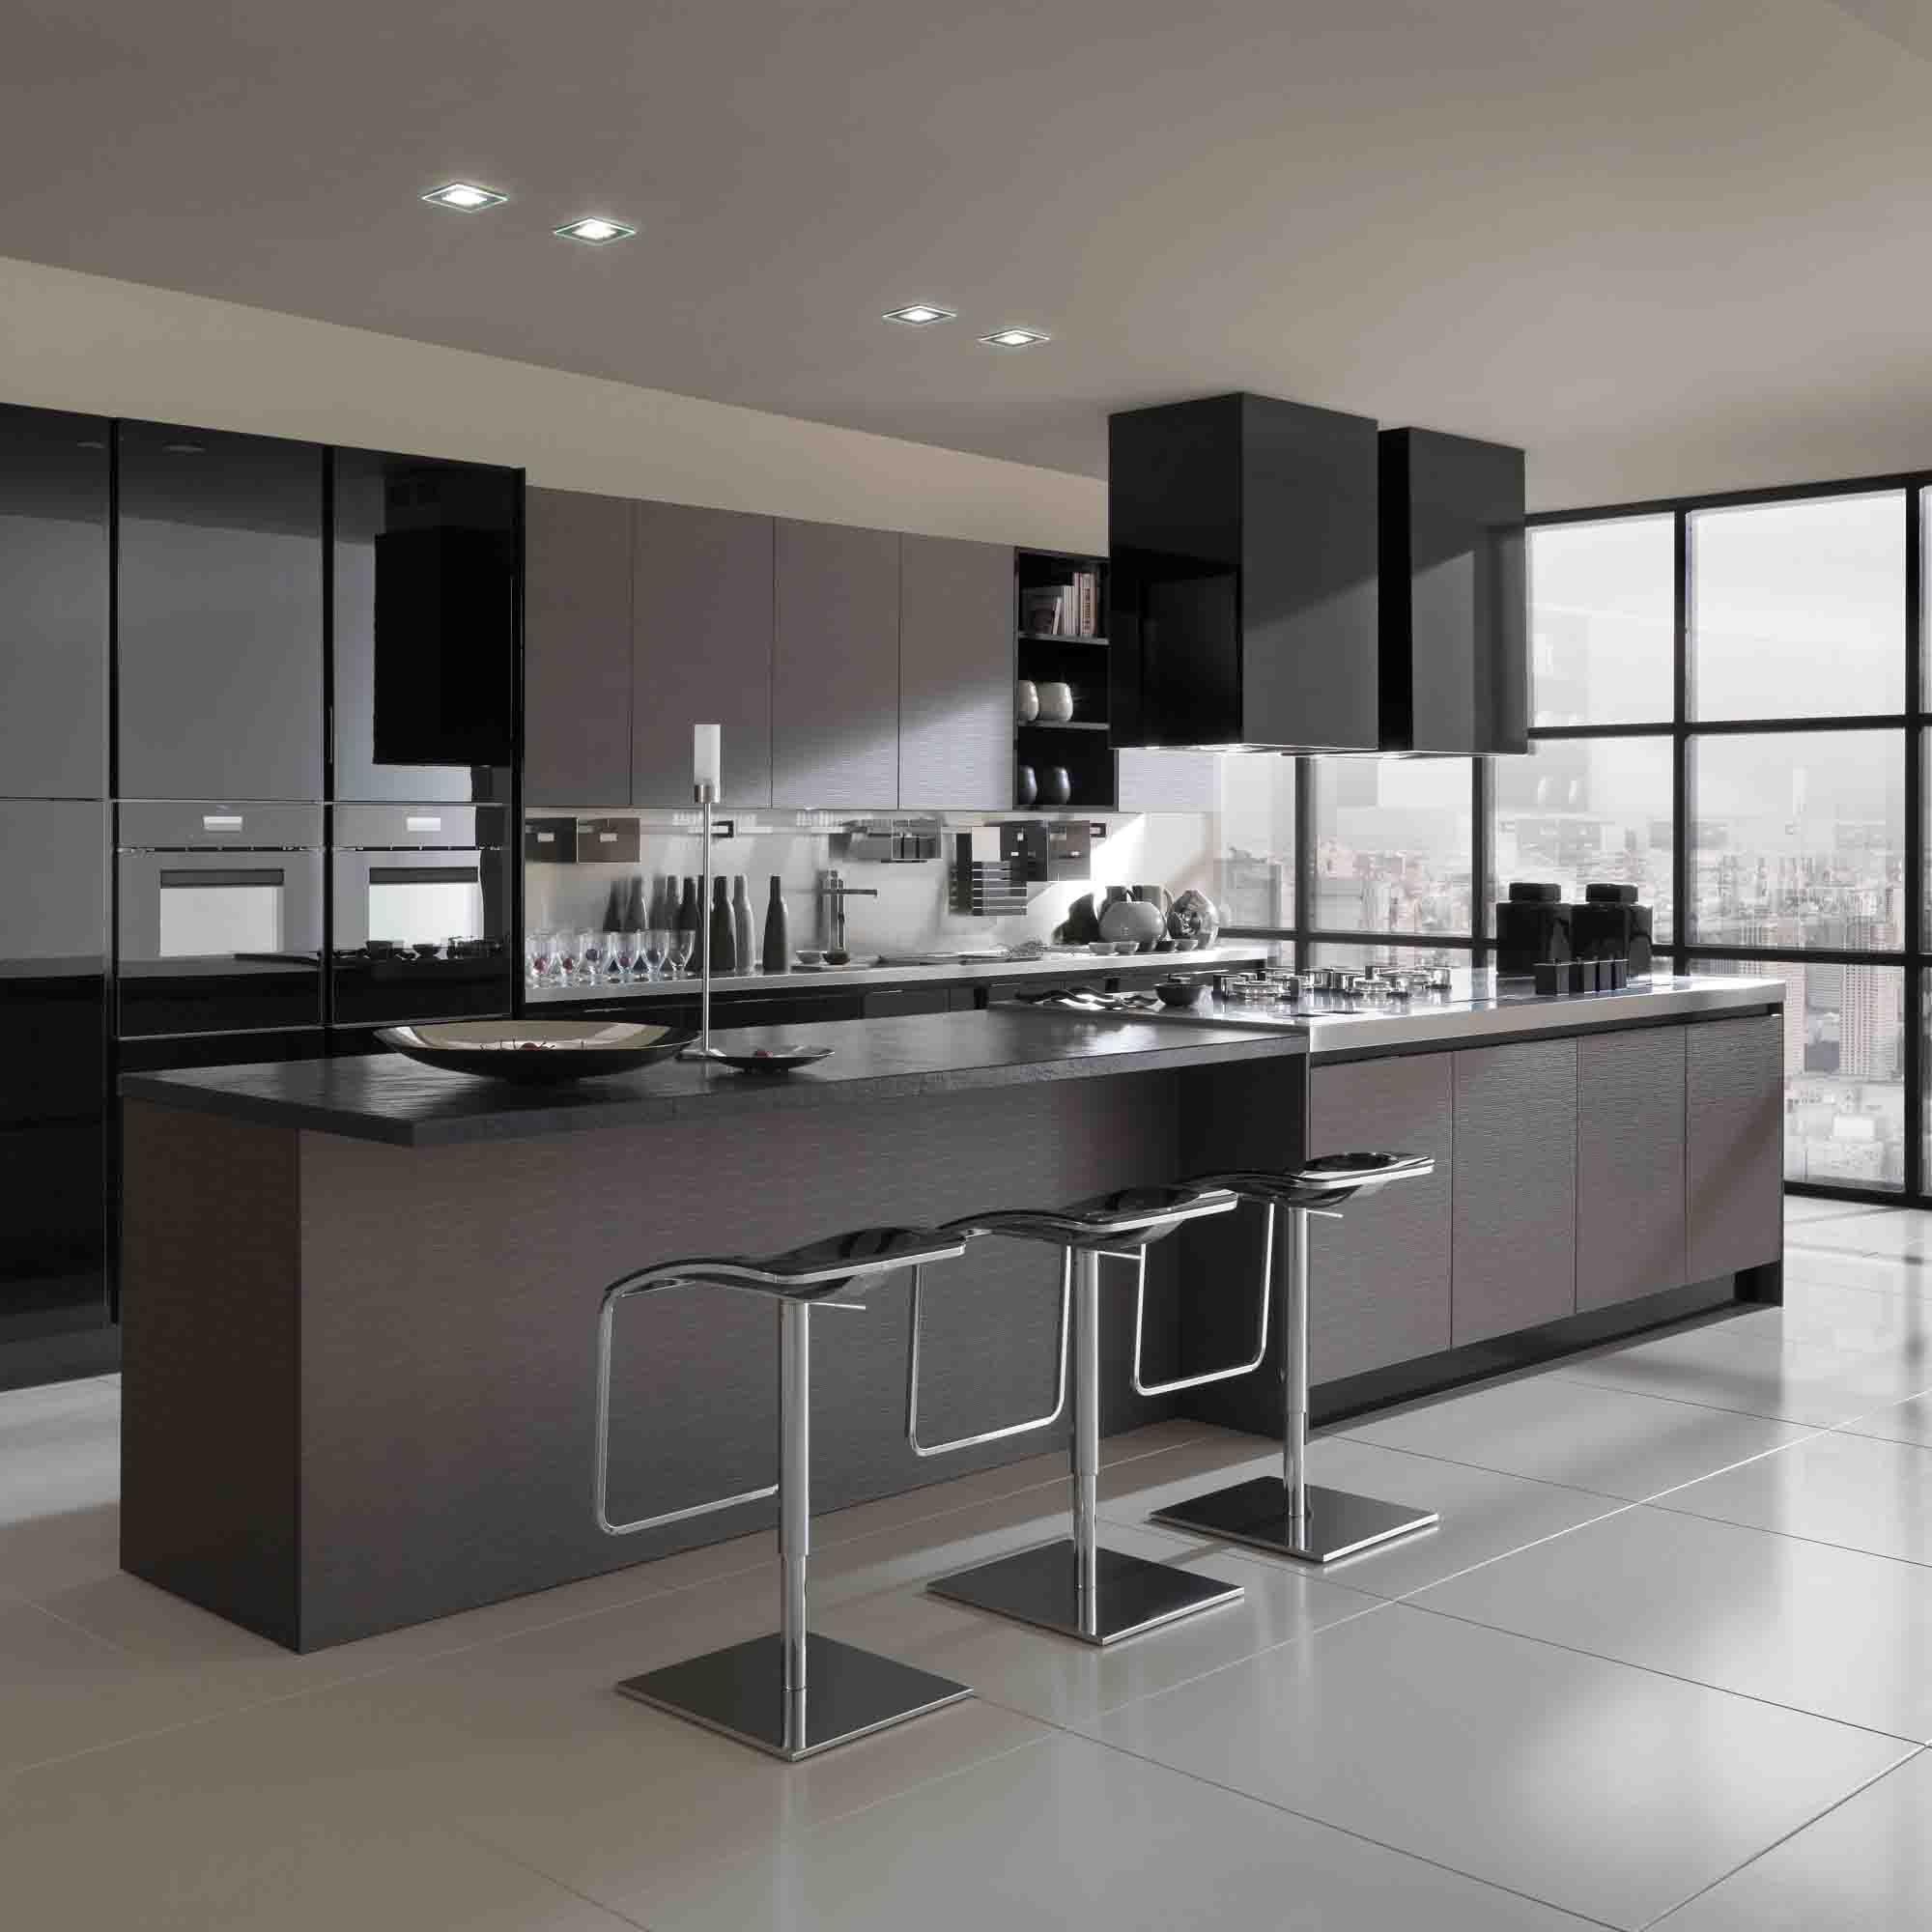 cocina con desayunador | arquitecturas | Pinterest | Kitchens ...